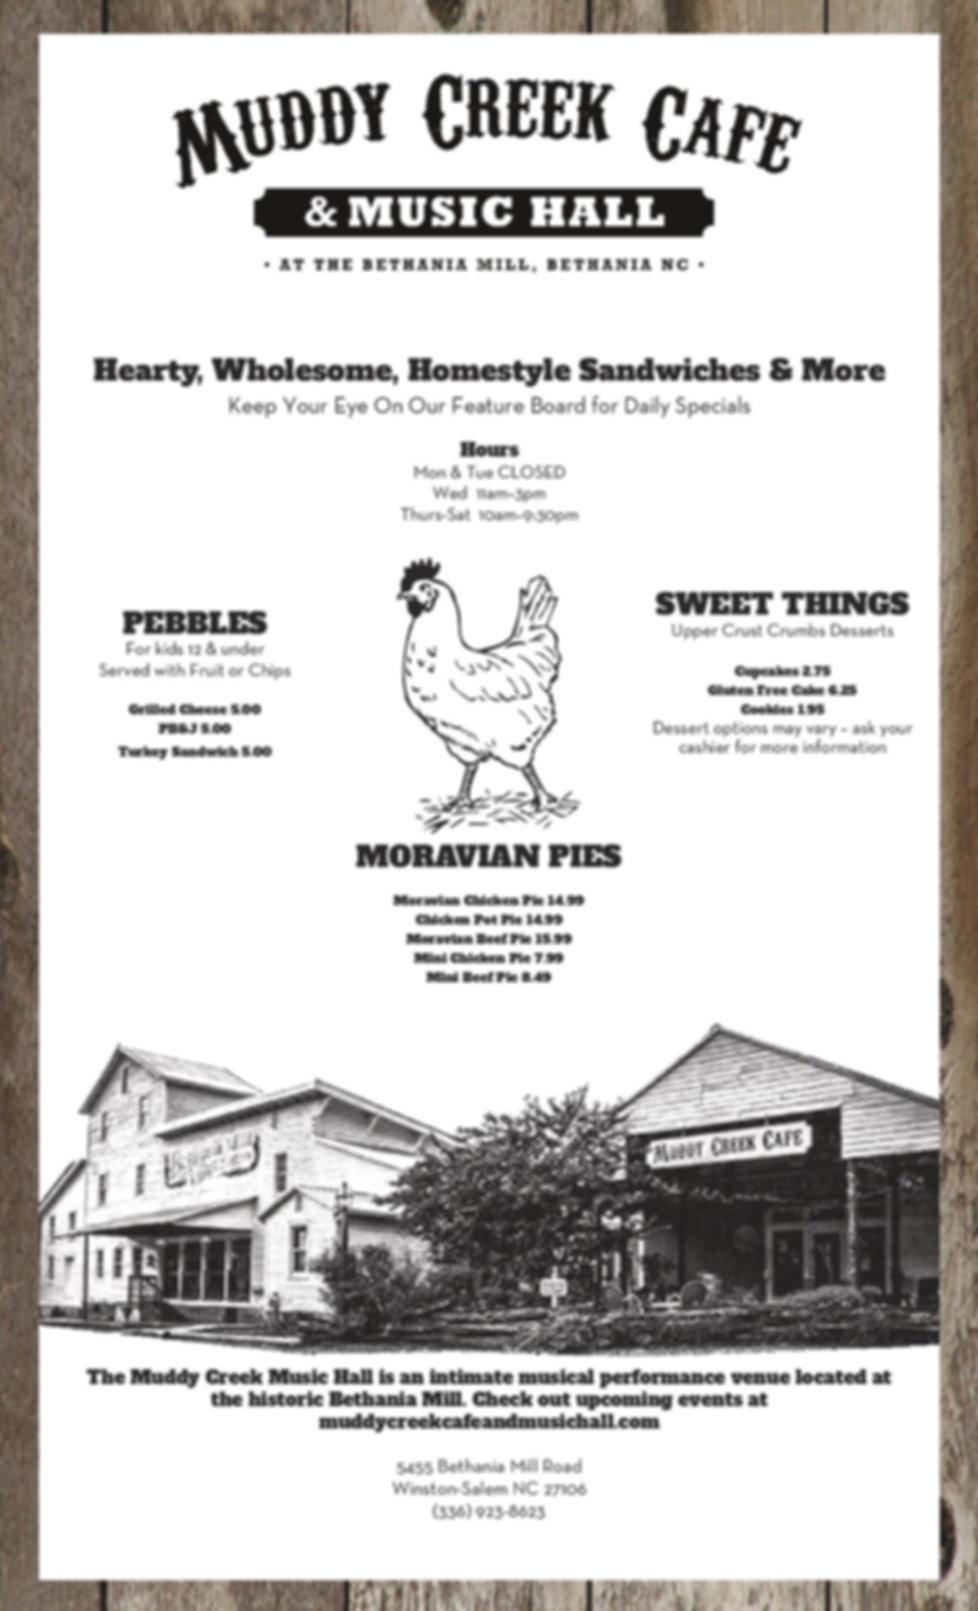 mcc-menu.2018.2-page-002.jpg